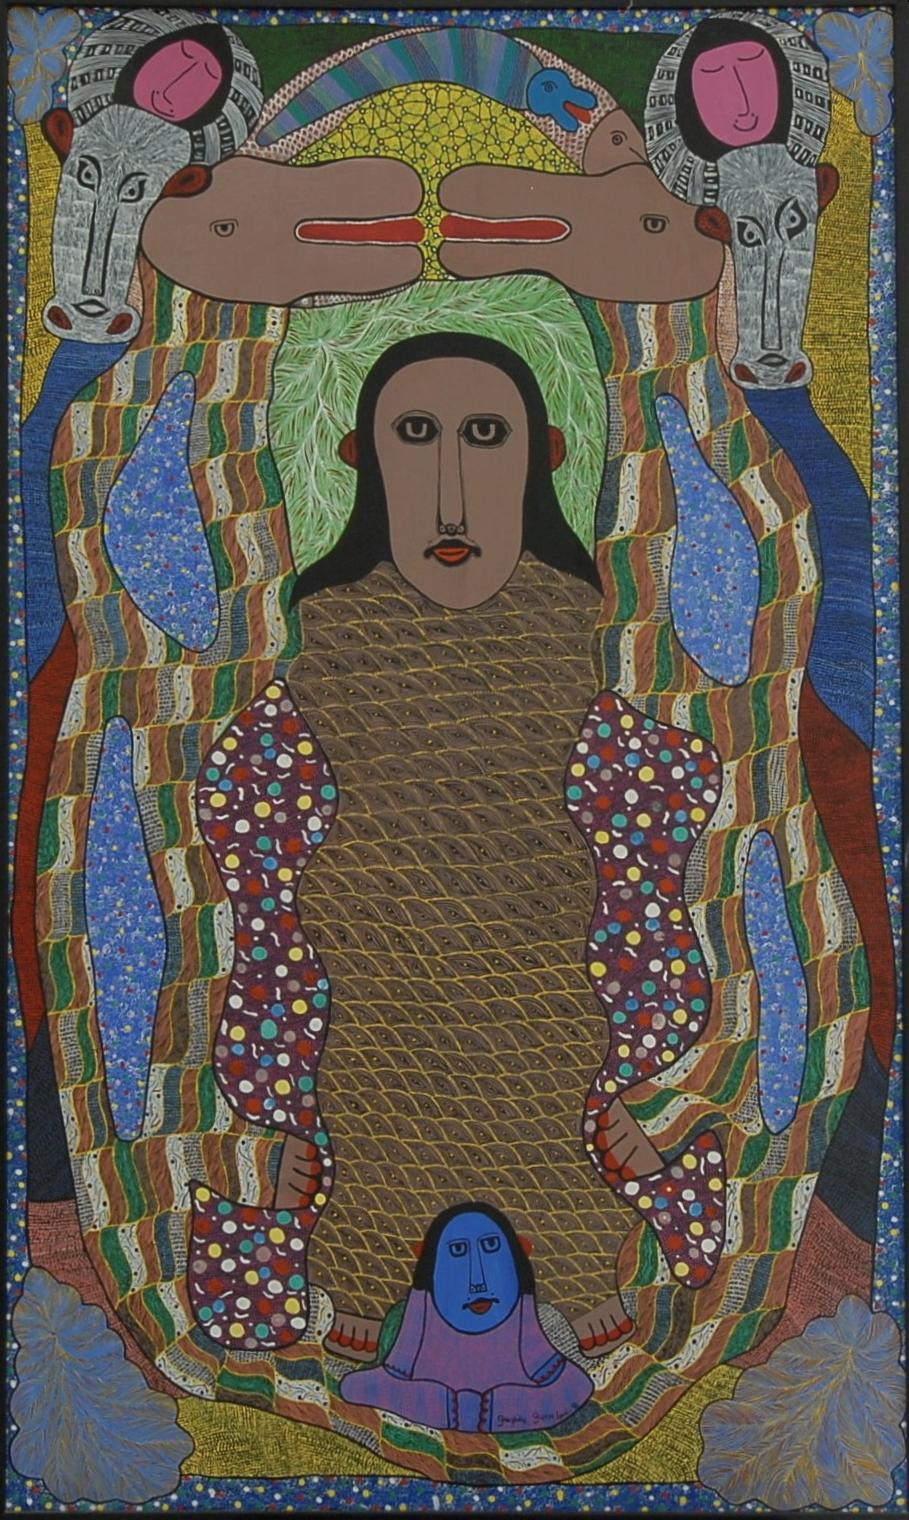 Voodoo Spiritual Loa artwork by  Prospere Pierre Louis - art listed for sale on Artplode